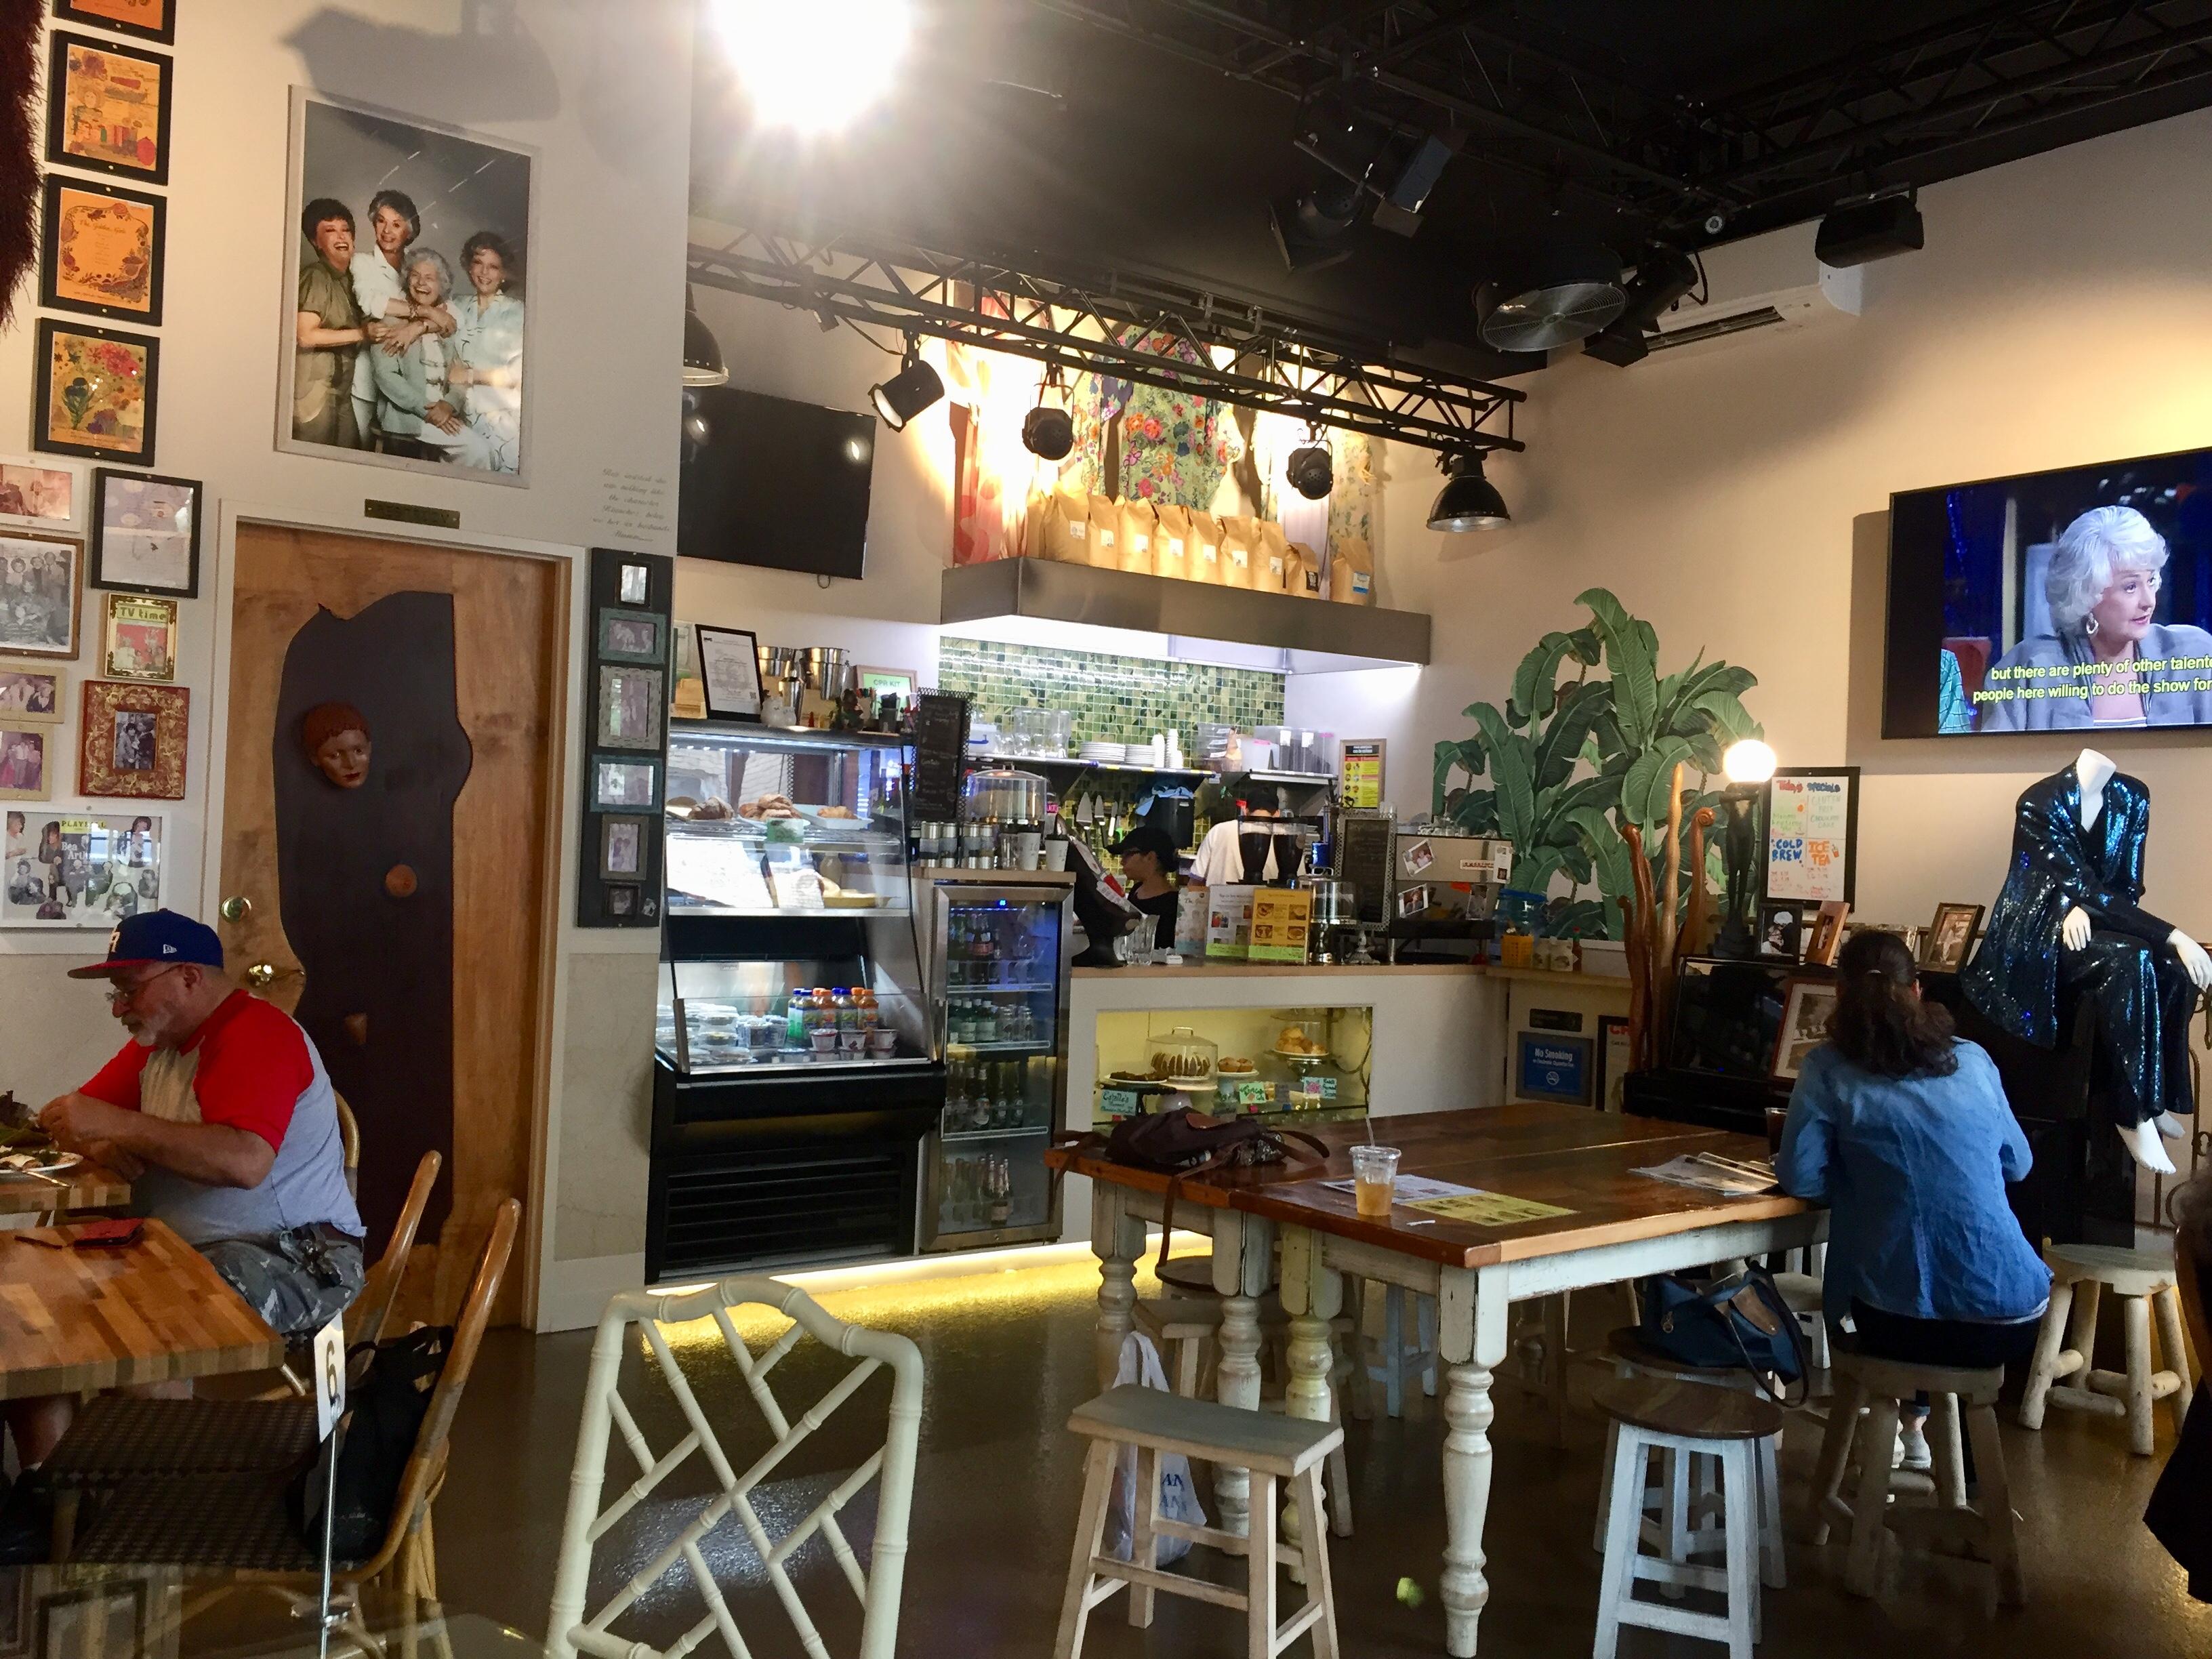 Restaurant roundup amarillo 2017 - Golden Girls Cafe Shutters After Less Than A Year